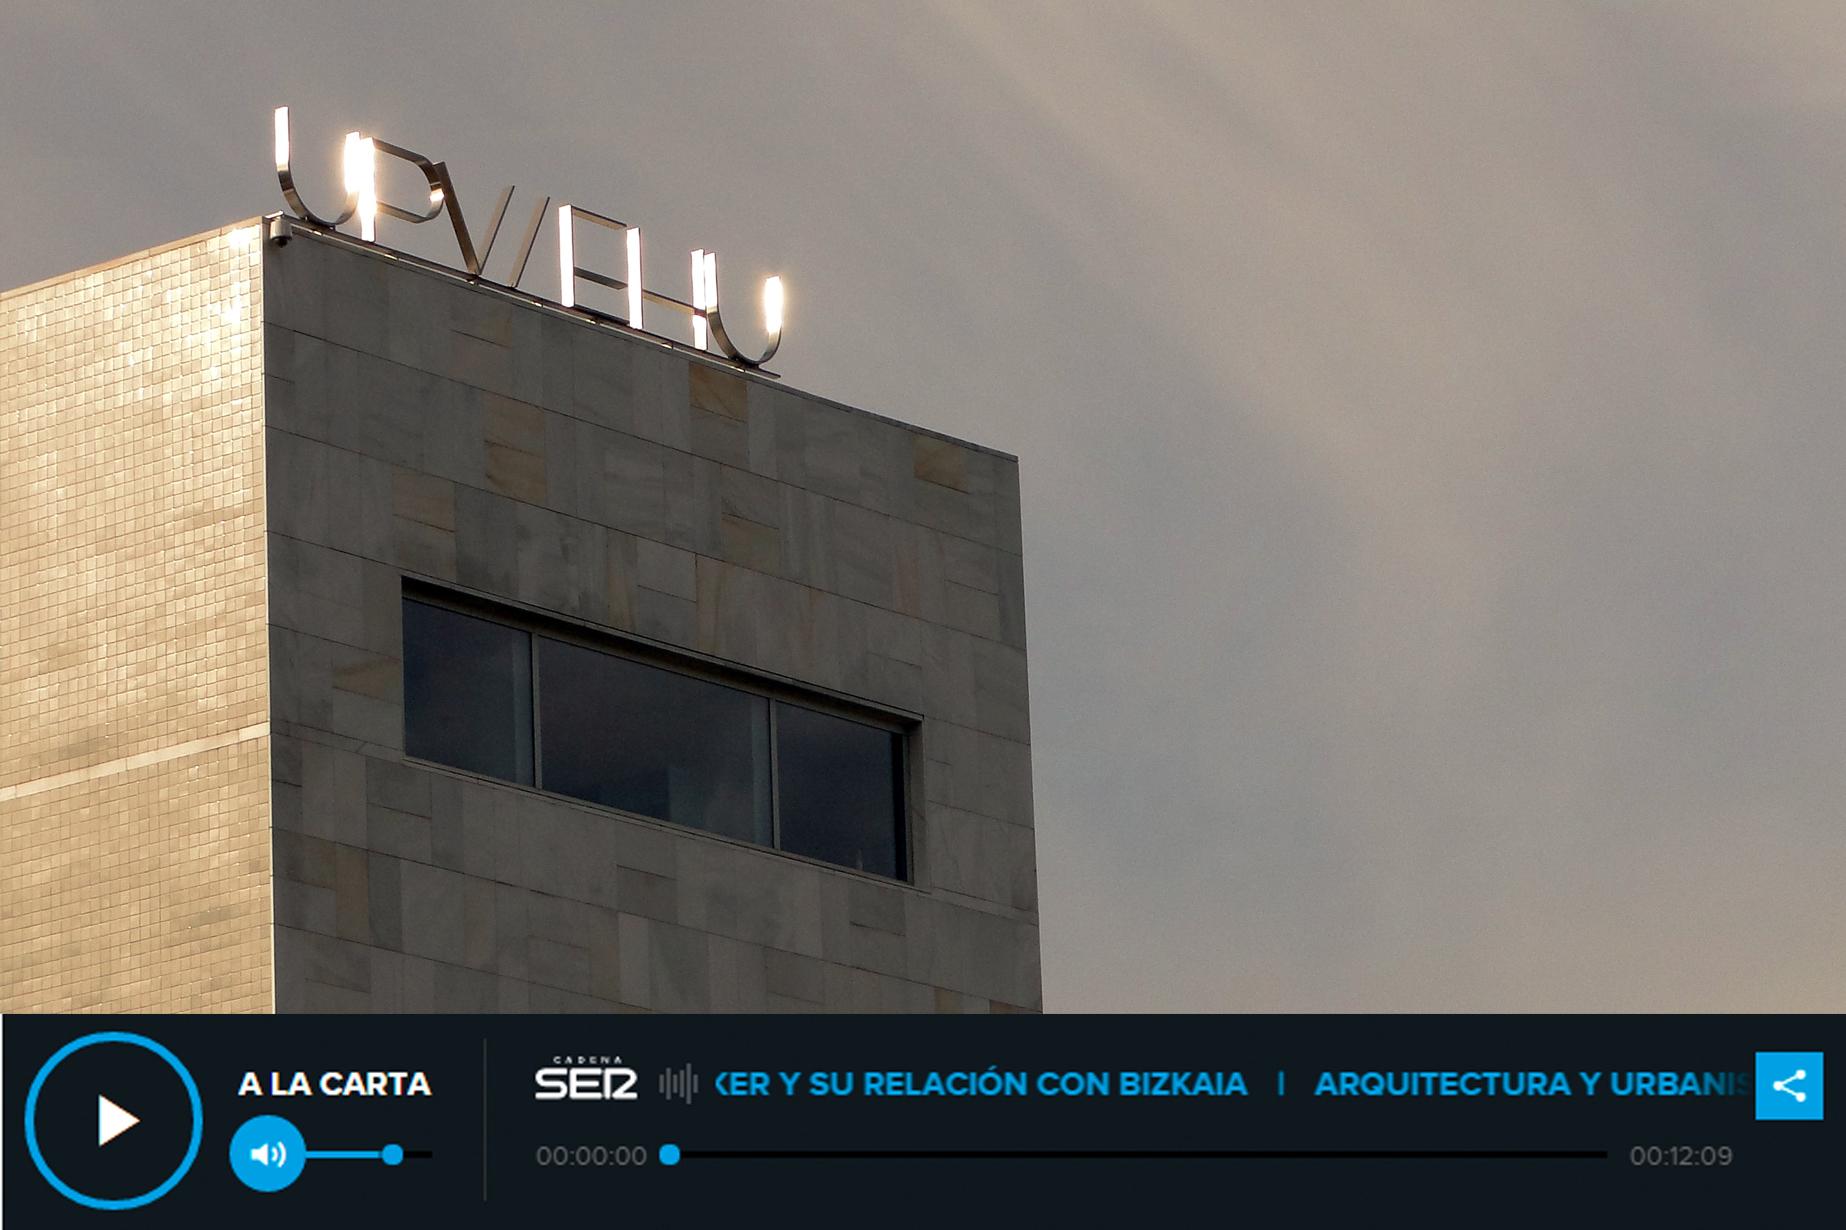 paraninfo UPV-EHU Bizkaia Aretoa de Alvaro Siza en Bilbao